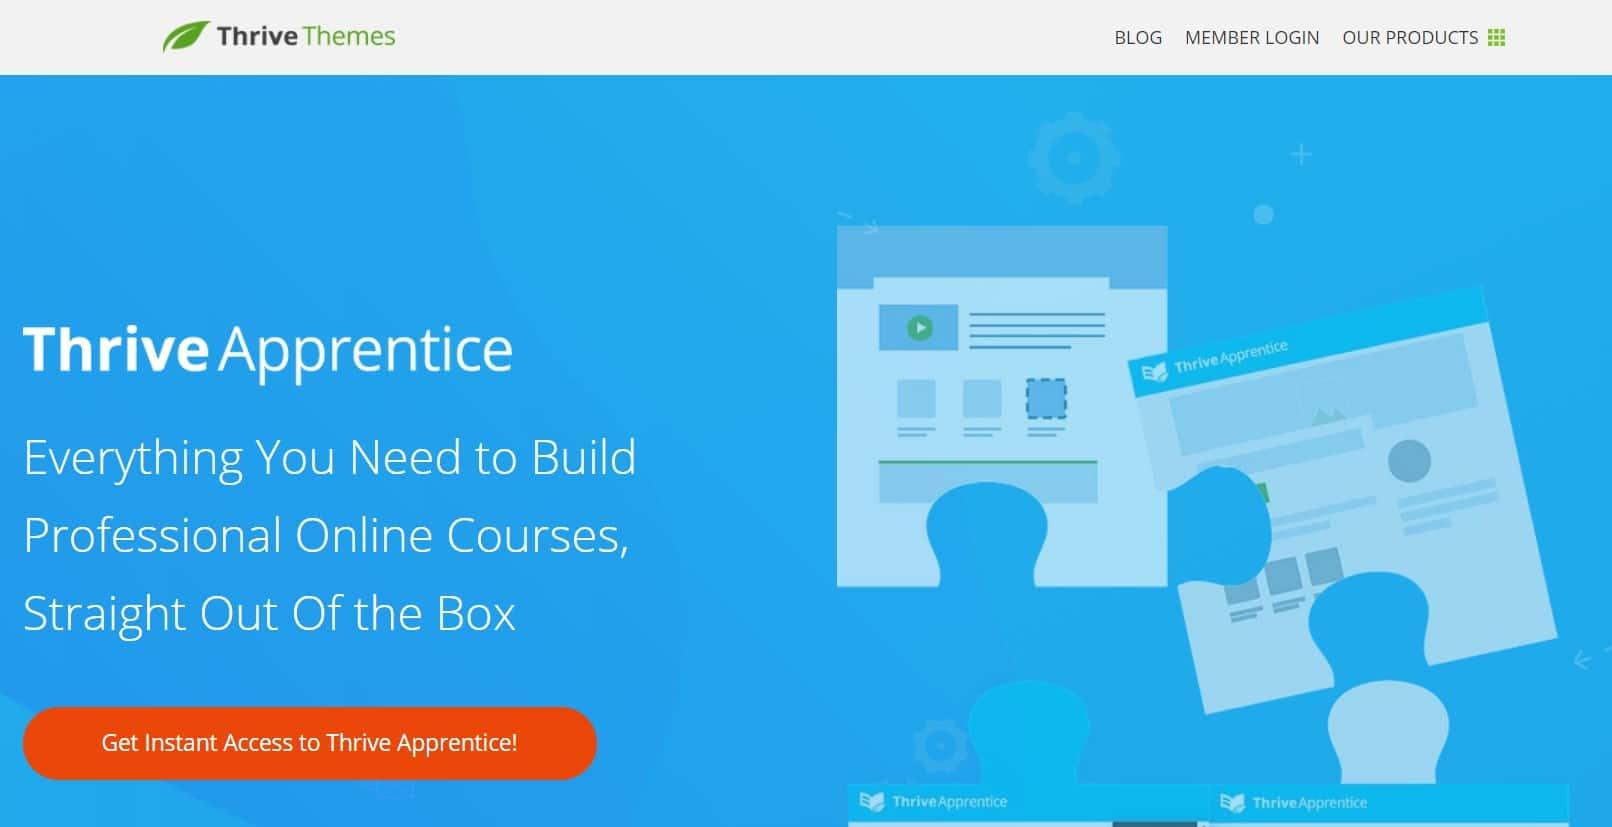 Thrive Themes Apprentice un plugin LMS